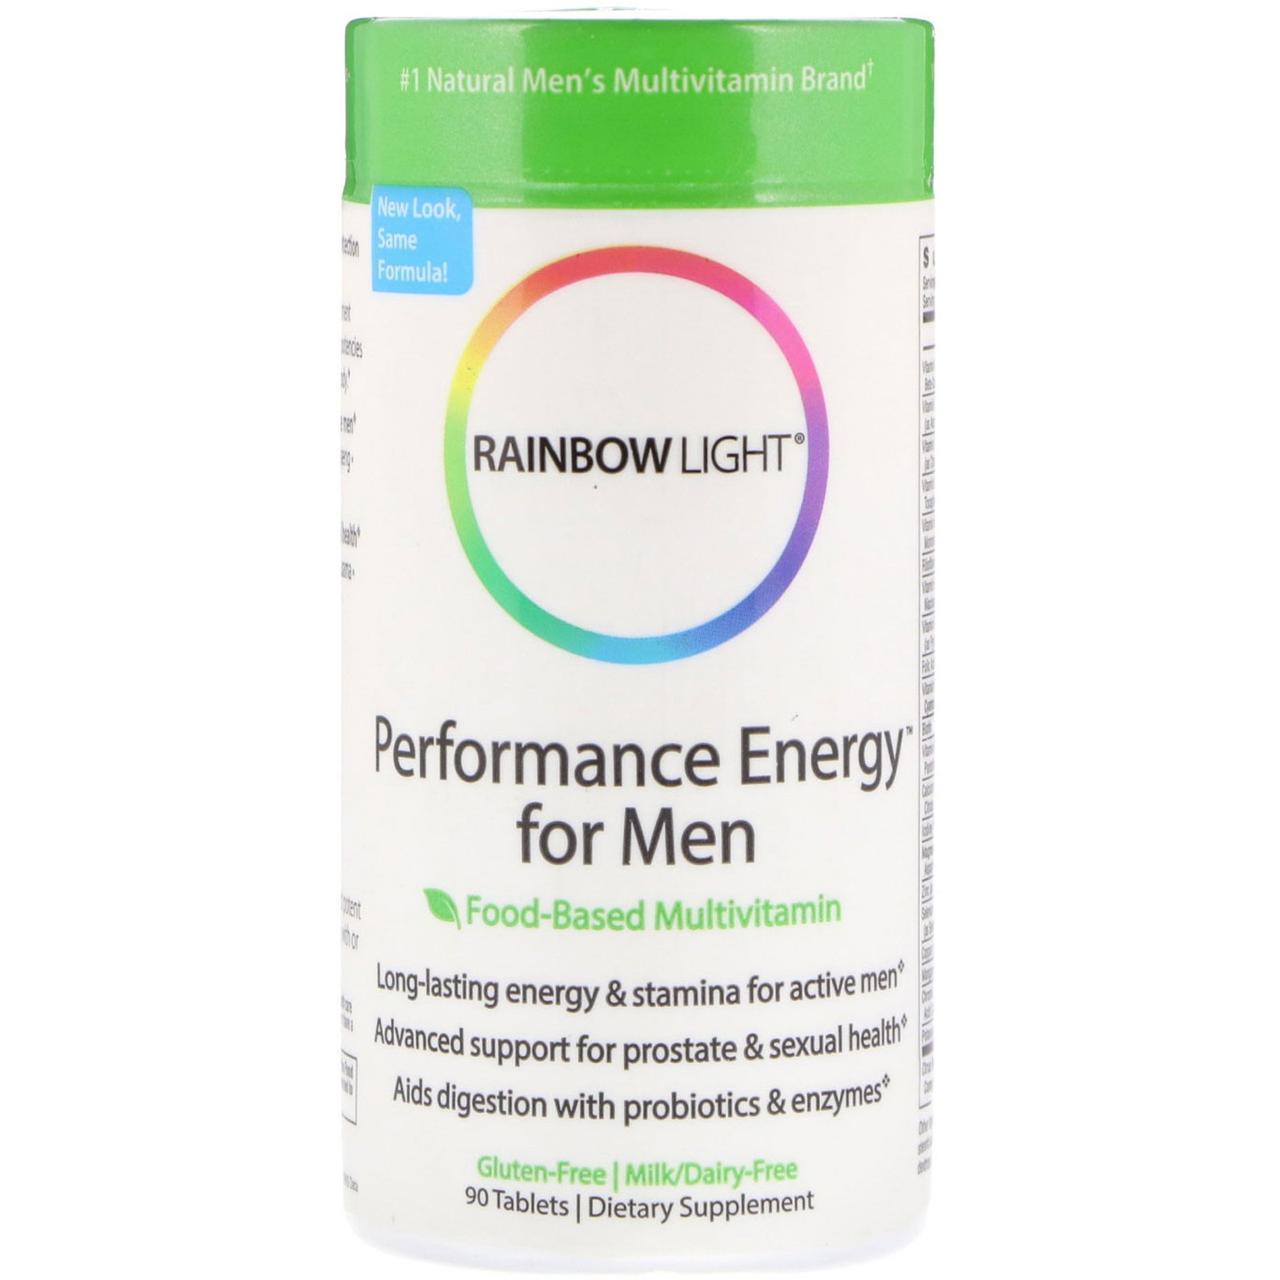 Витамины для мужчин Rainbow Light, Performance Energy для мужчин, мультивитамины, 90 таблеток